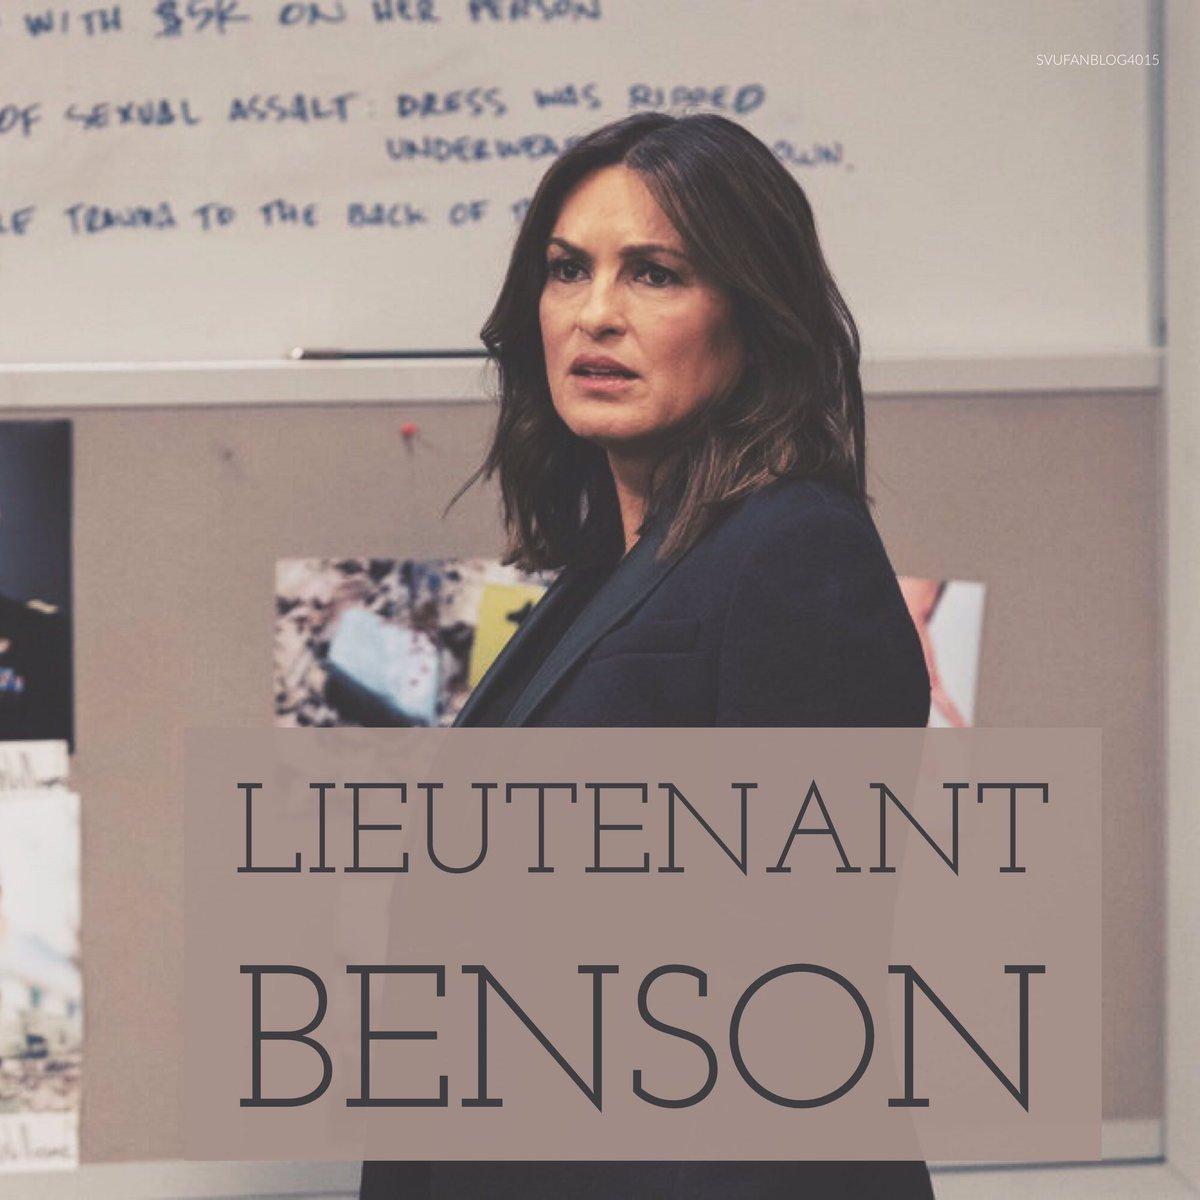 Lieutenant Benson! #MariskaHargitay #SVU #Gorgeous #FanArtFriday #FanArt<br>http://pic.twitter.com/E32iIvHgX0